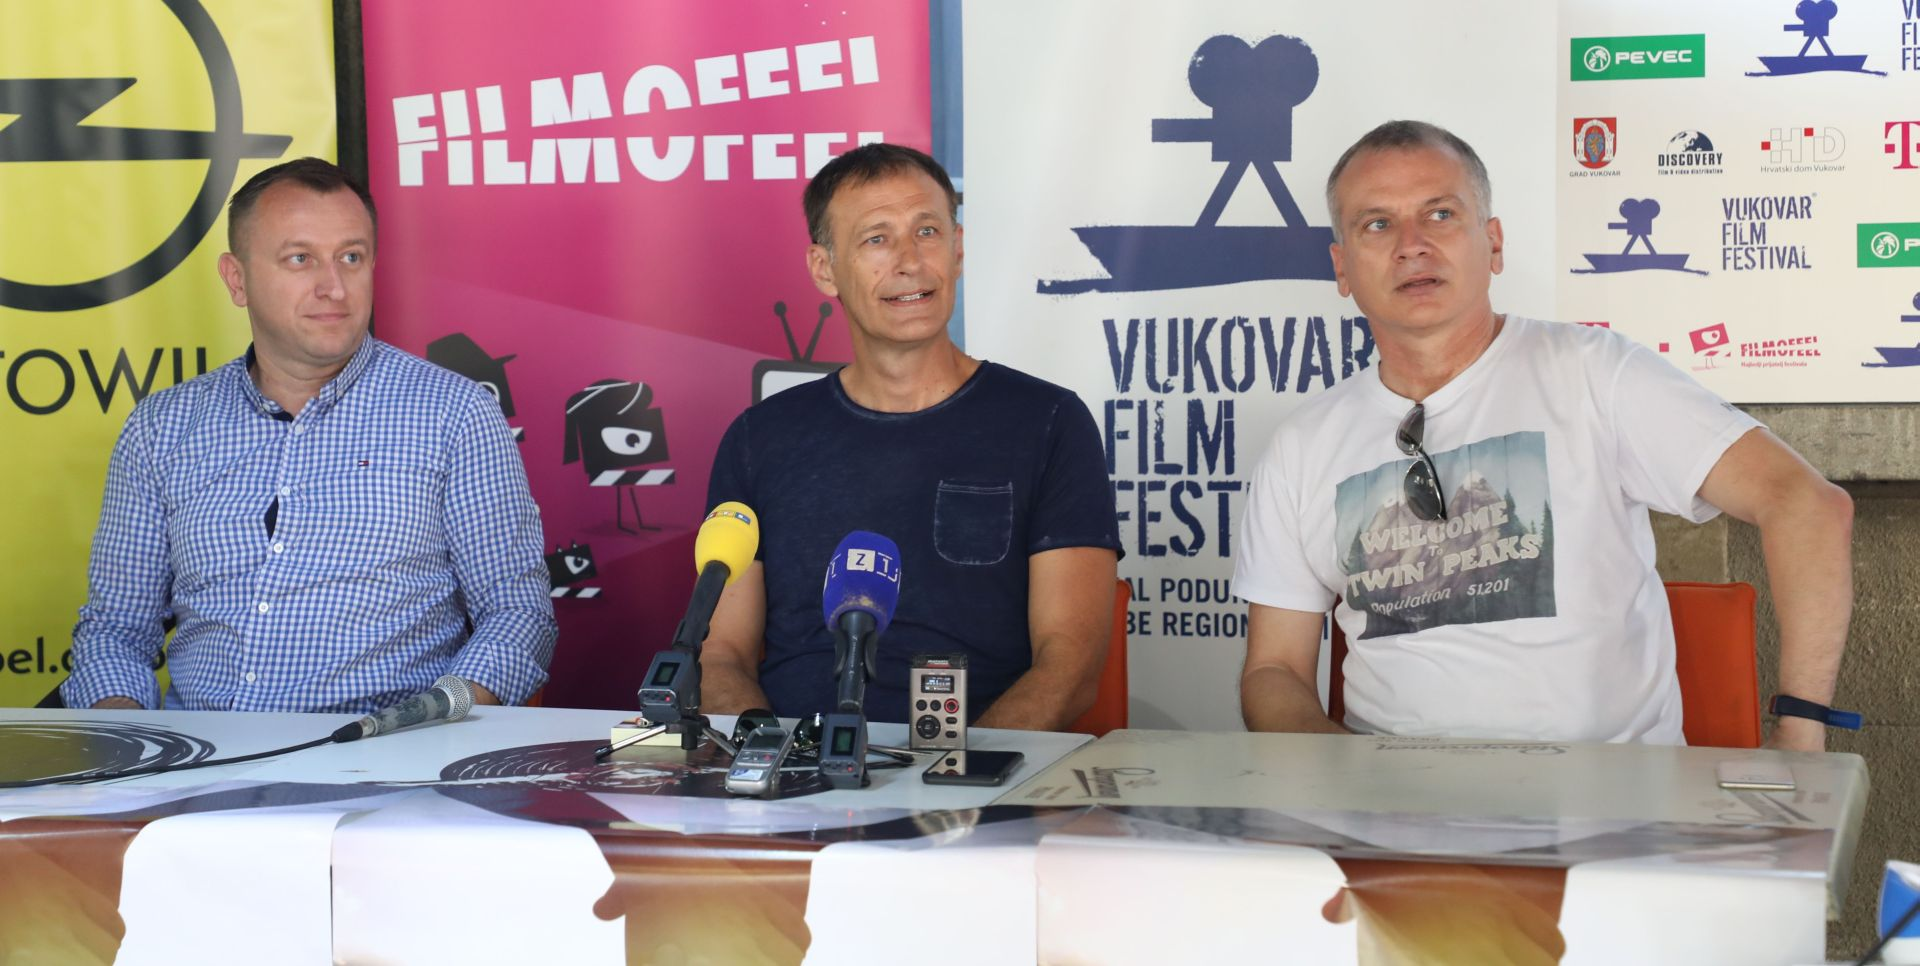 12. Vukovar Film Festival: Najkvalitetniji filmovi s najznačajnijih festivala